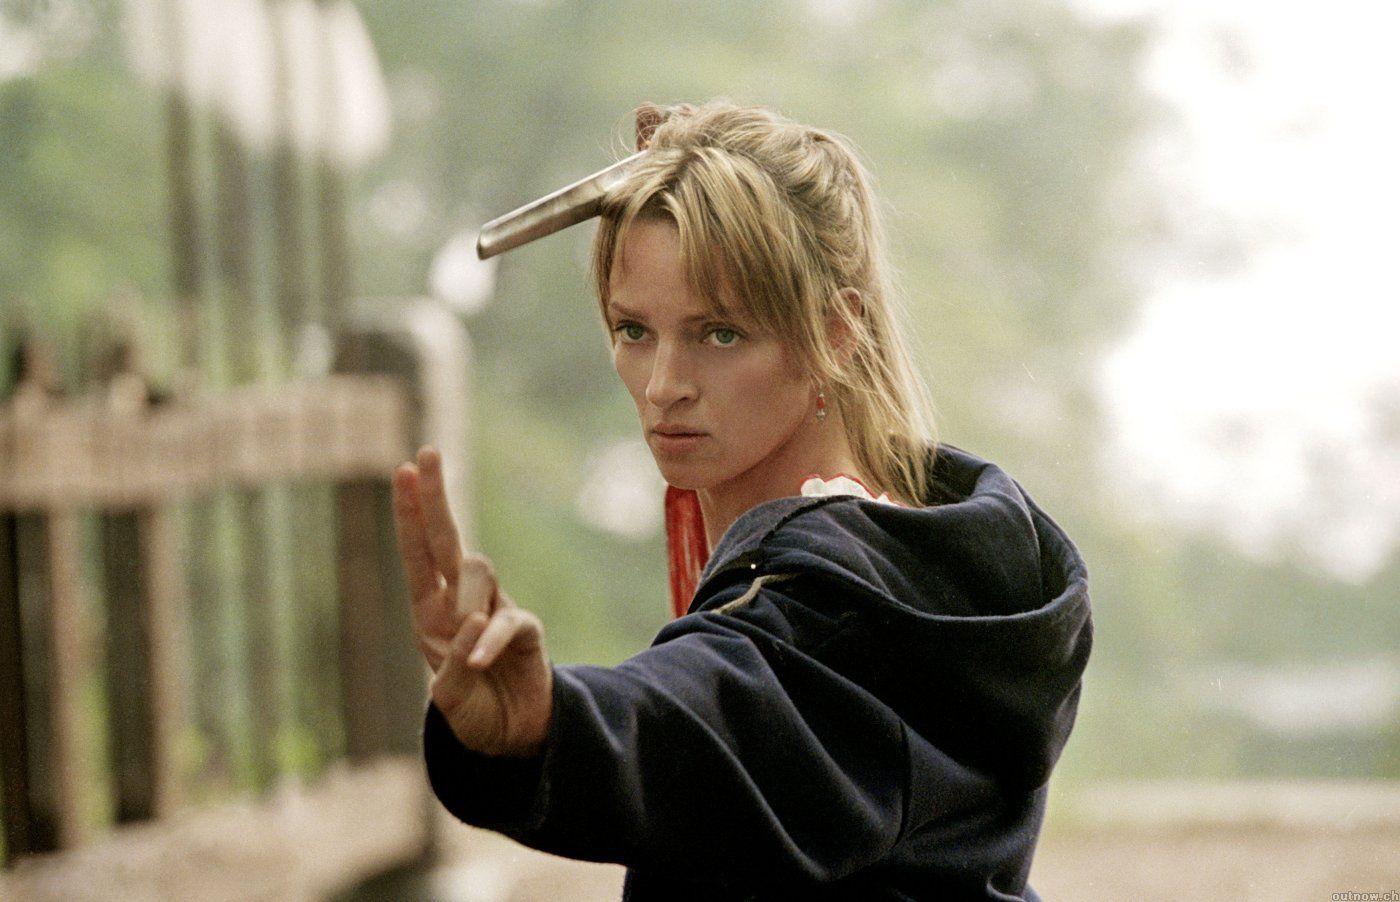 Quentin Tarantino Habla con Uma Thurman de Kill Bill 3 - Película